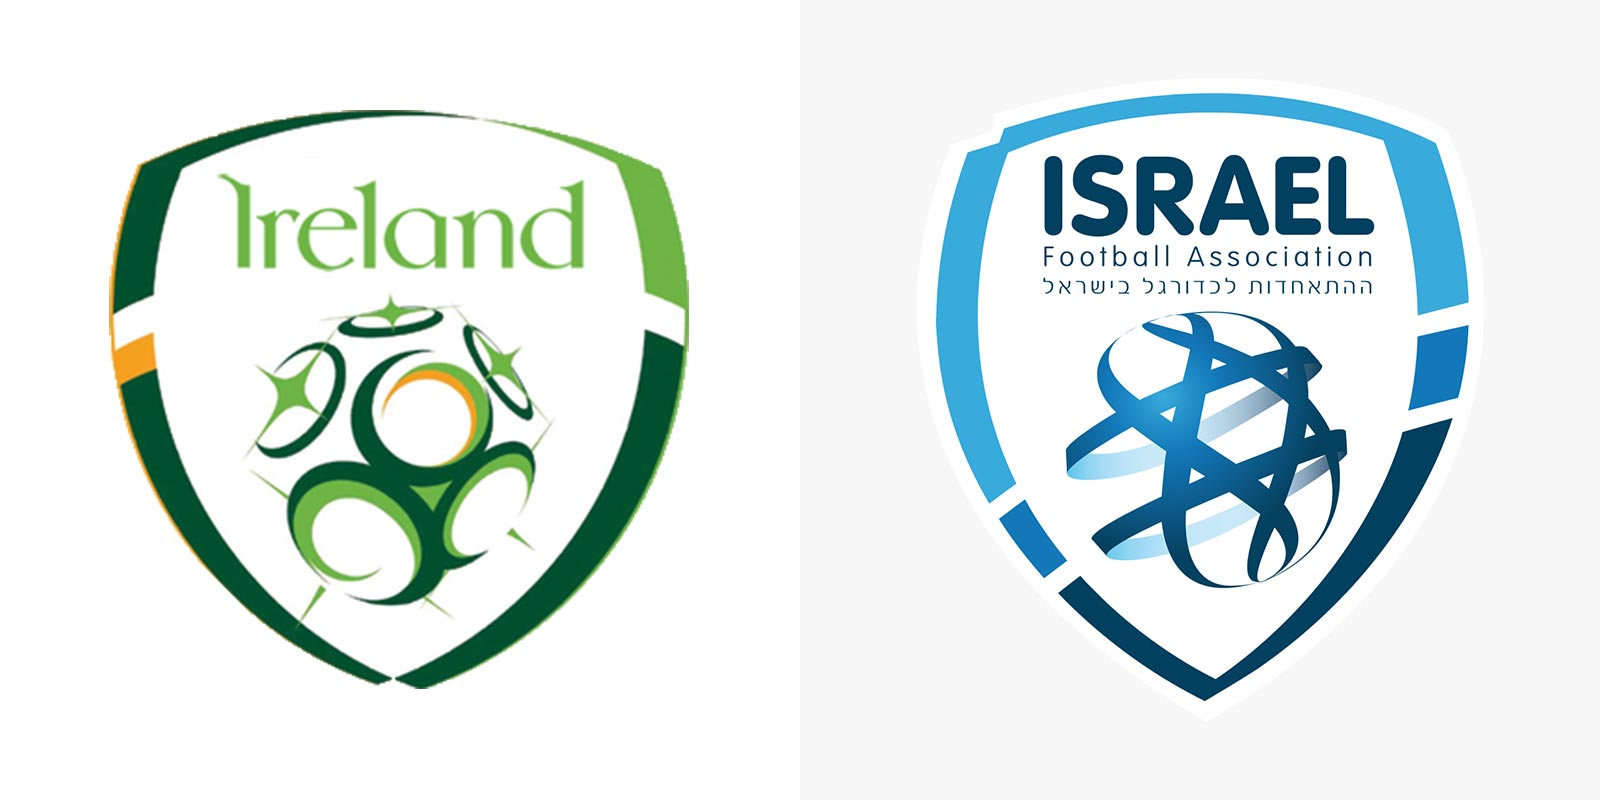 Ireland - Israel